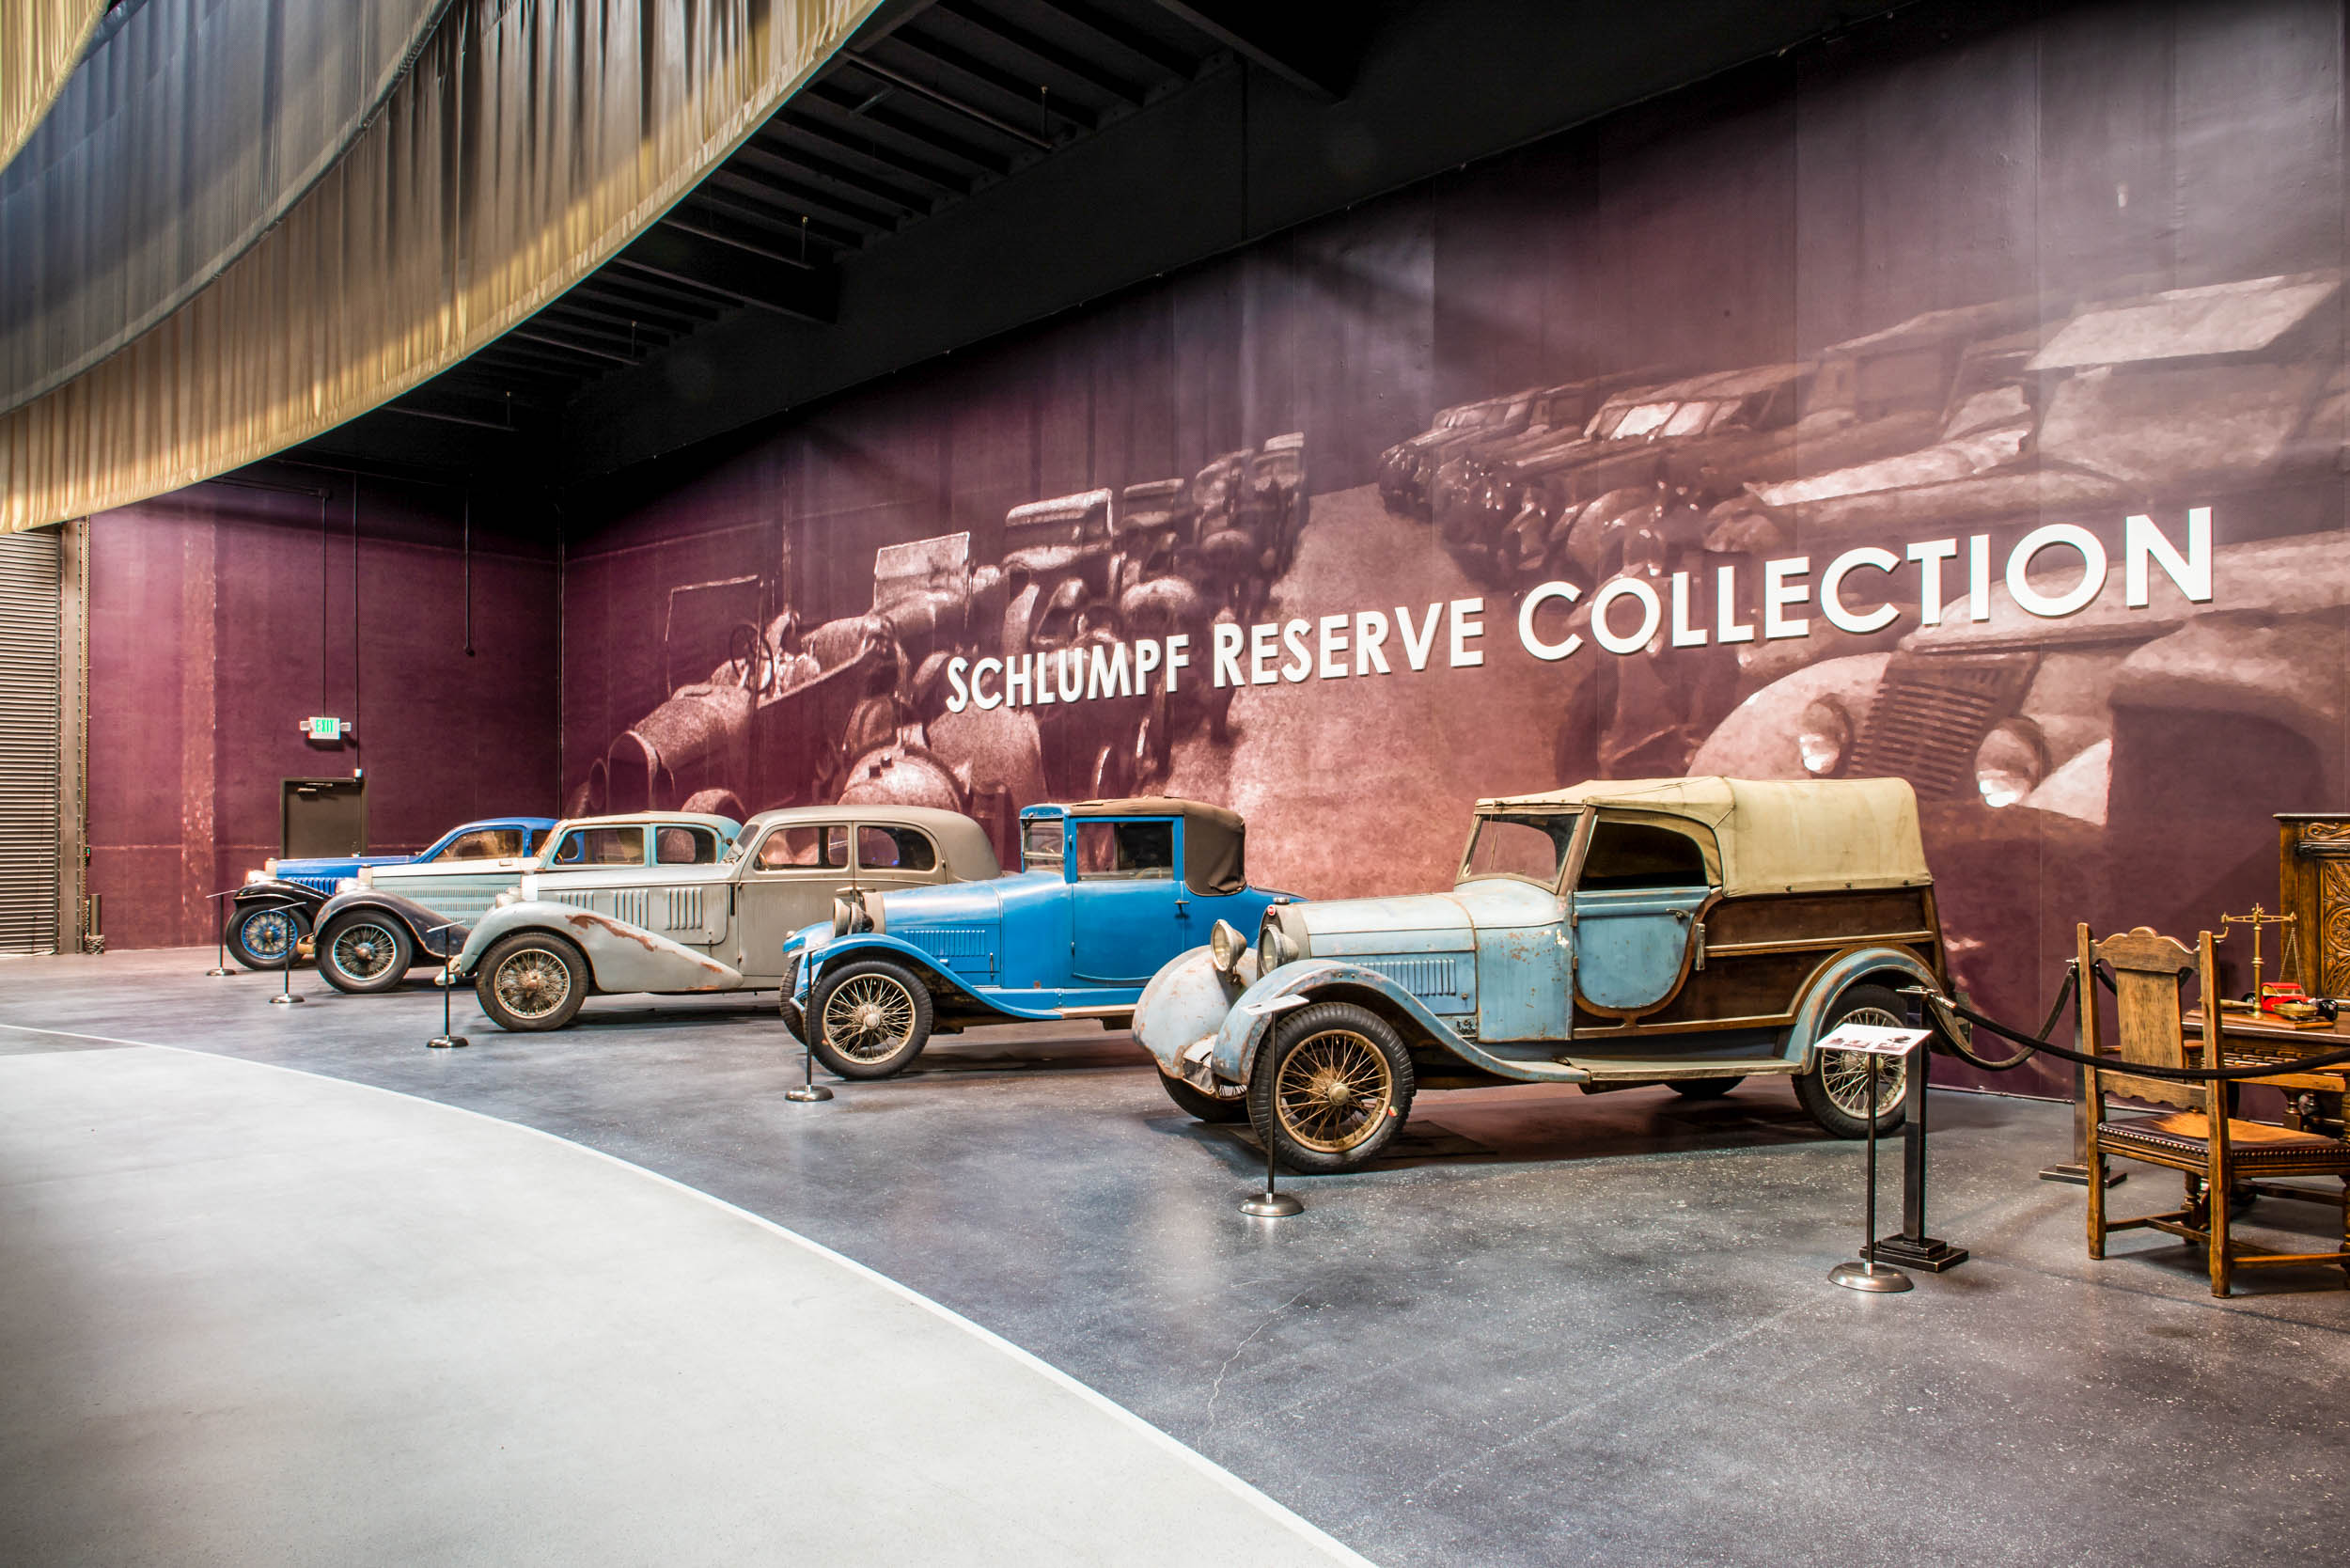 Bugatti Collection Fritz Schlumpfphoto mullin schlumpf